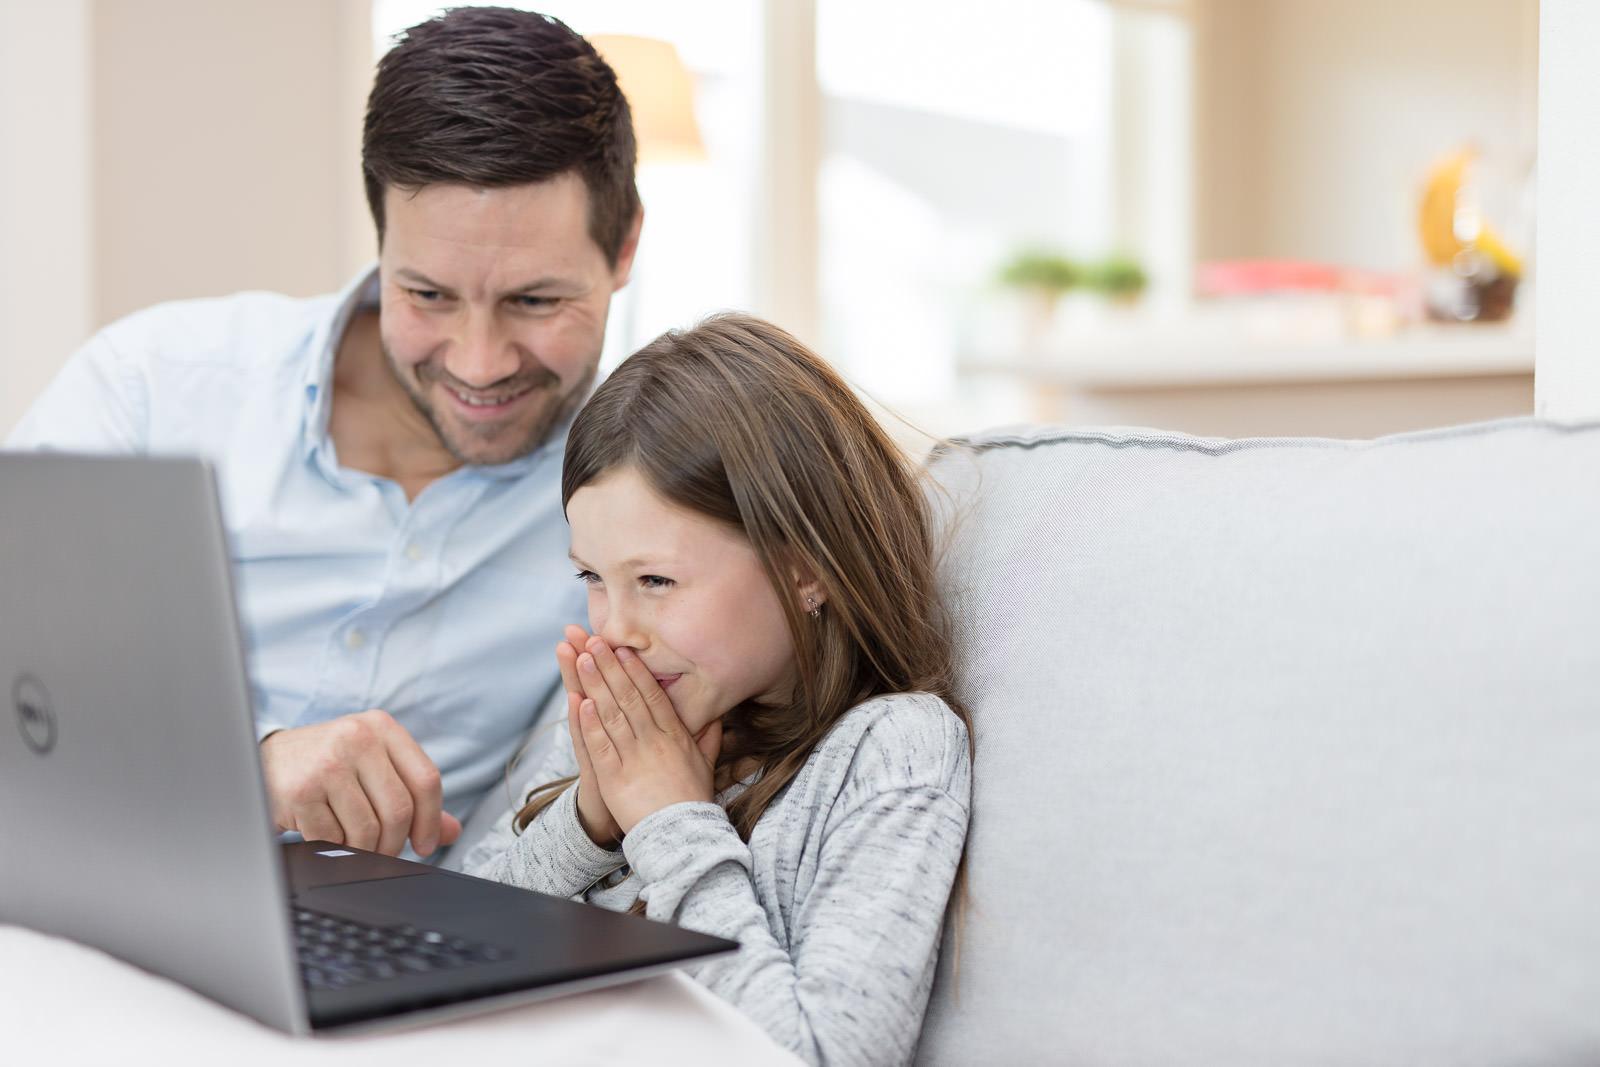 170925-pappa&dotter-dator-038.jpg